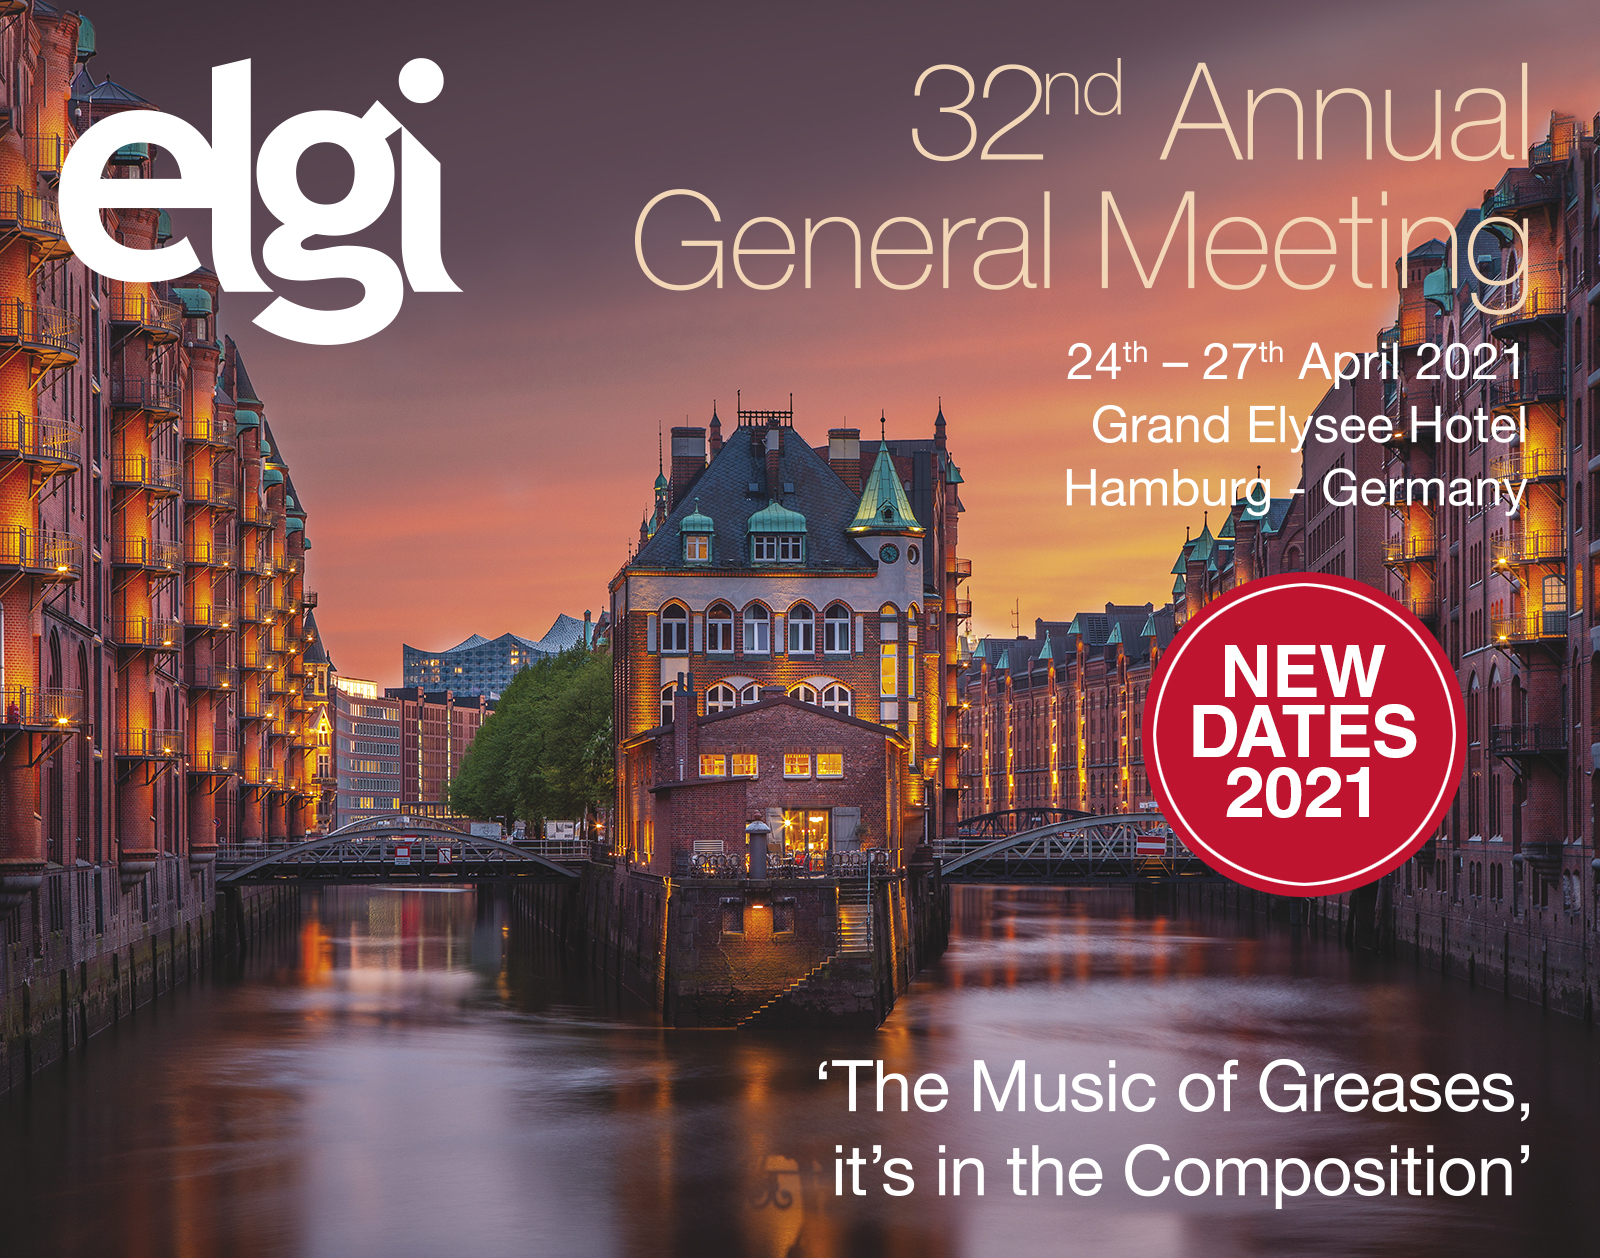 32nd ELGI Annual General Meeting Programme 25th -28 th April 2020. dans - - - AGENDA : img_hamburg1